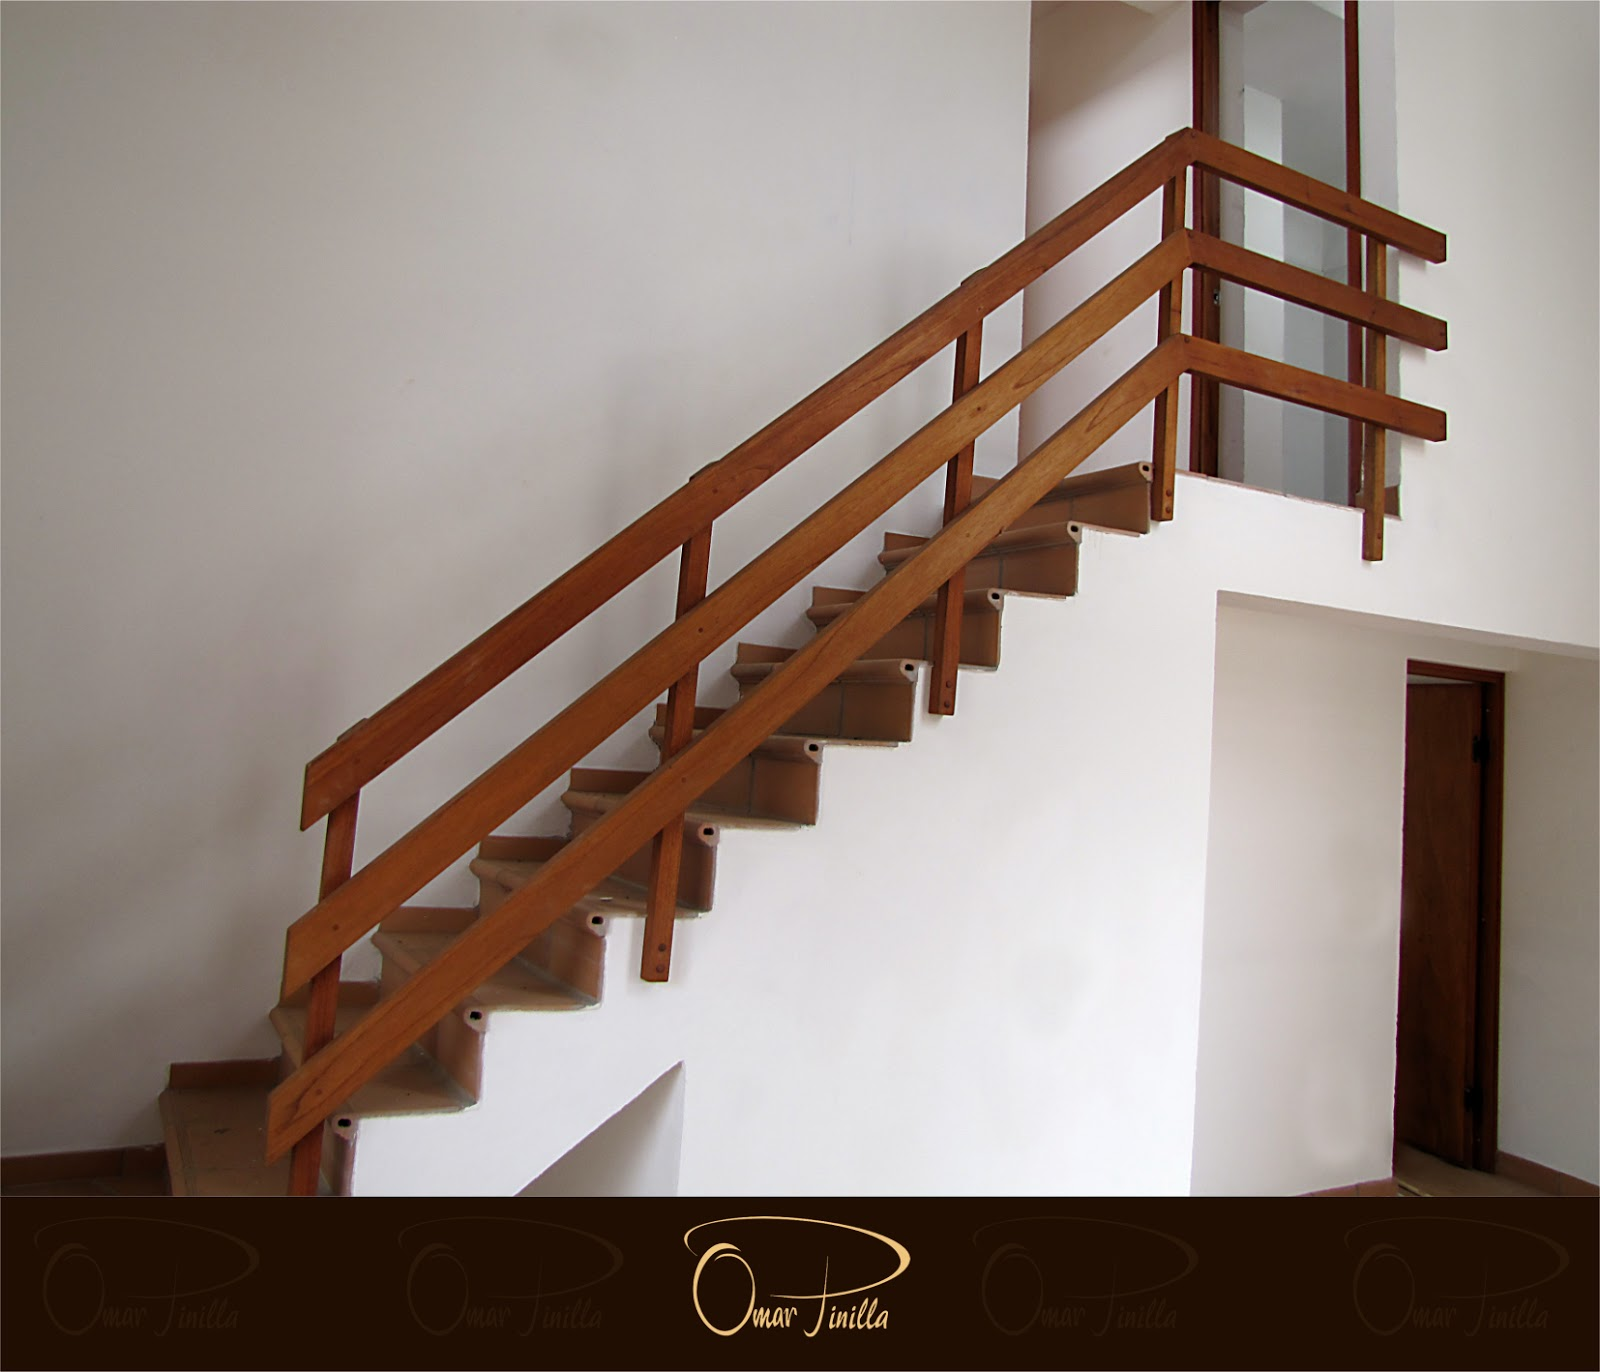 Muebles omar pinilla escaleras barandas - Barandas de escaleras de madera ...